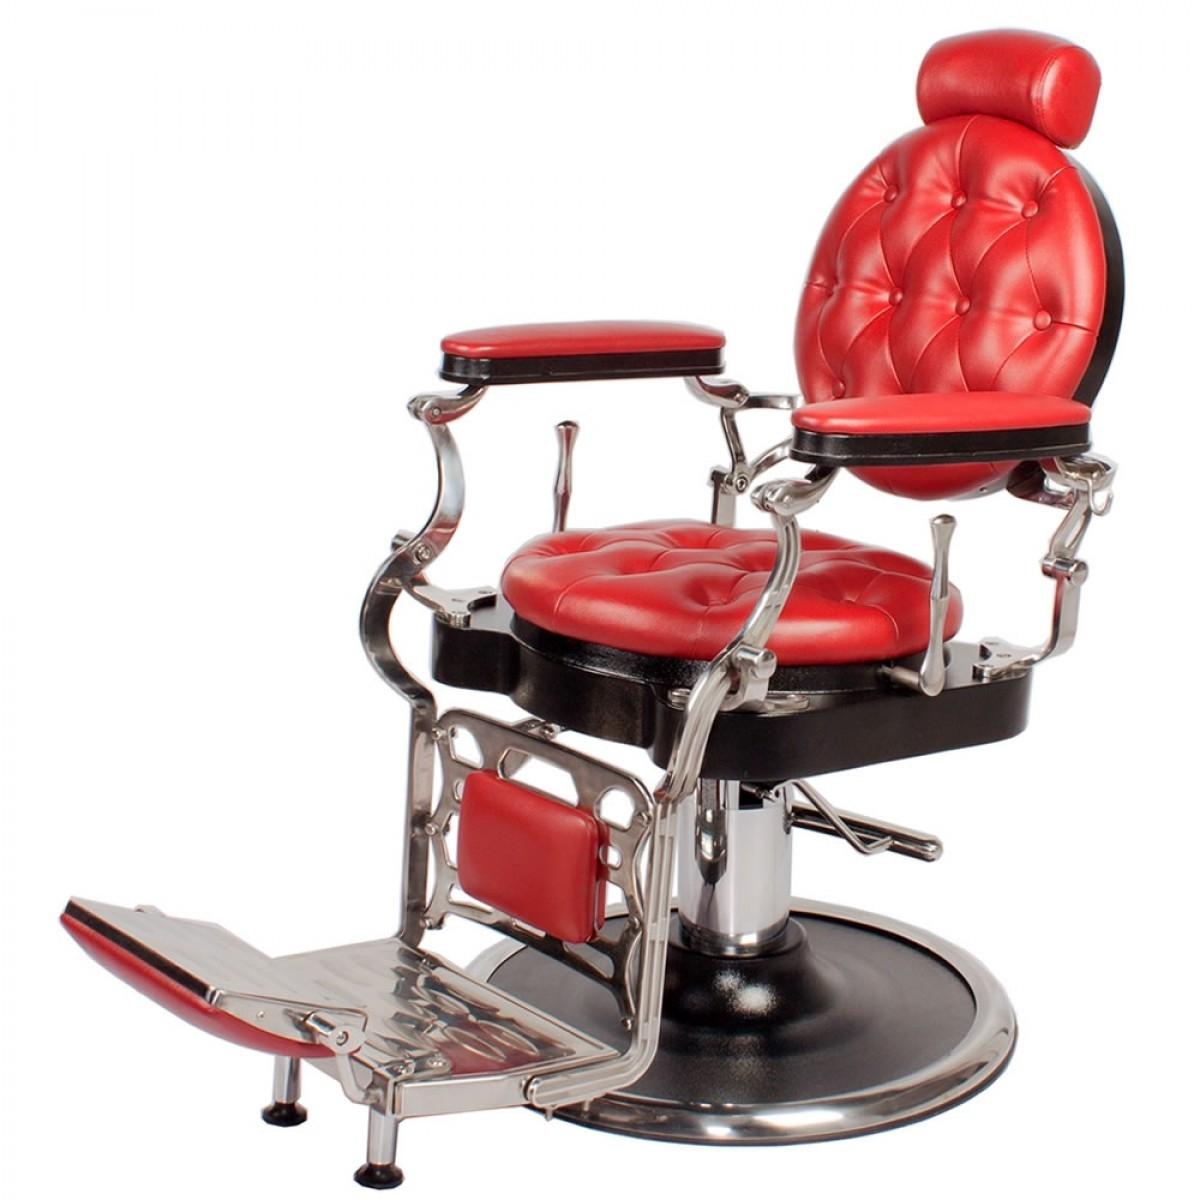 Salon Furniture Barber Chair Barber Chair Supplies Vintage